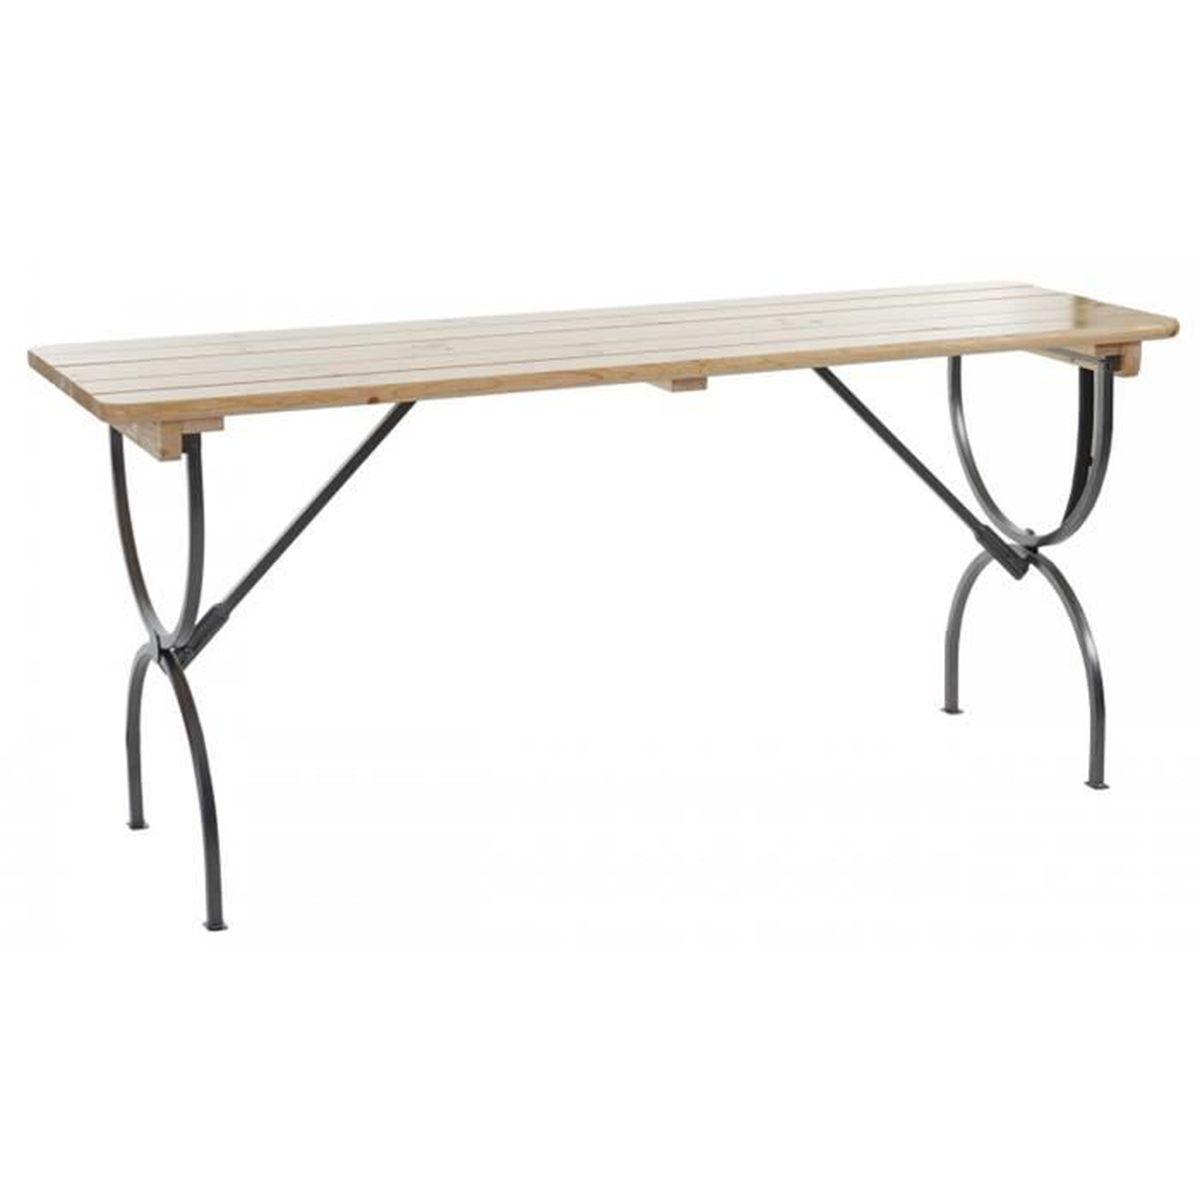 Table jardin bois et metal